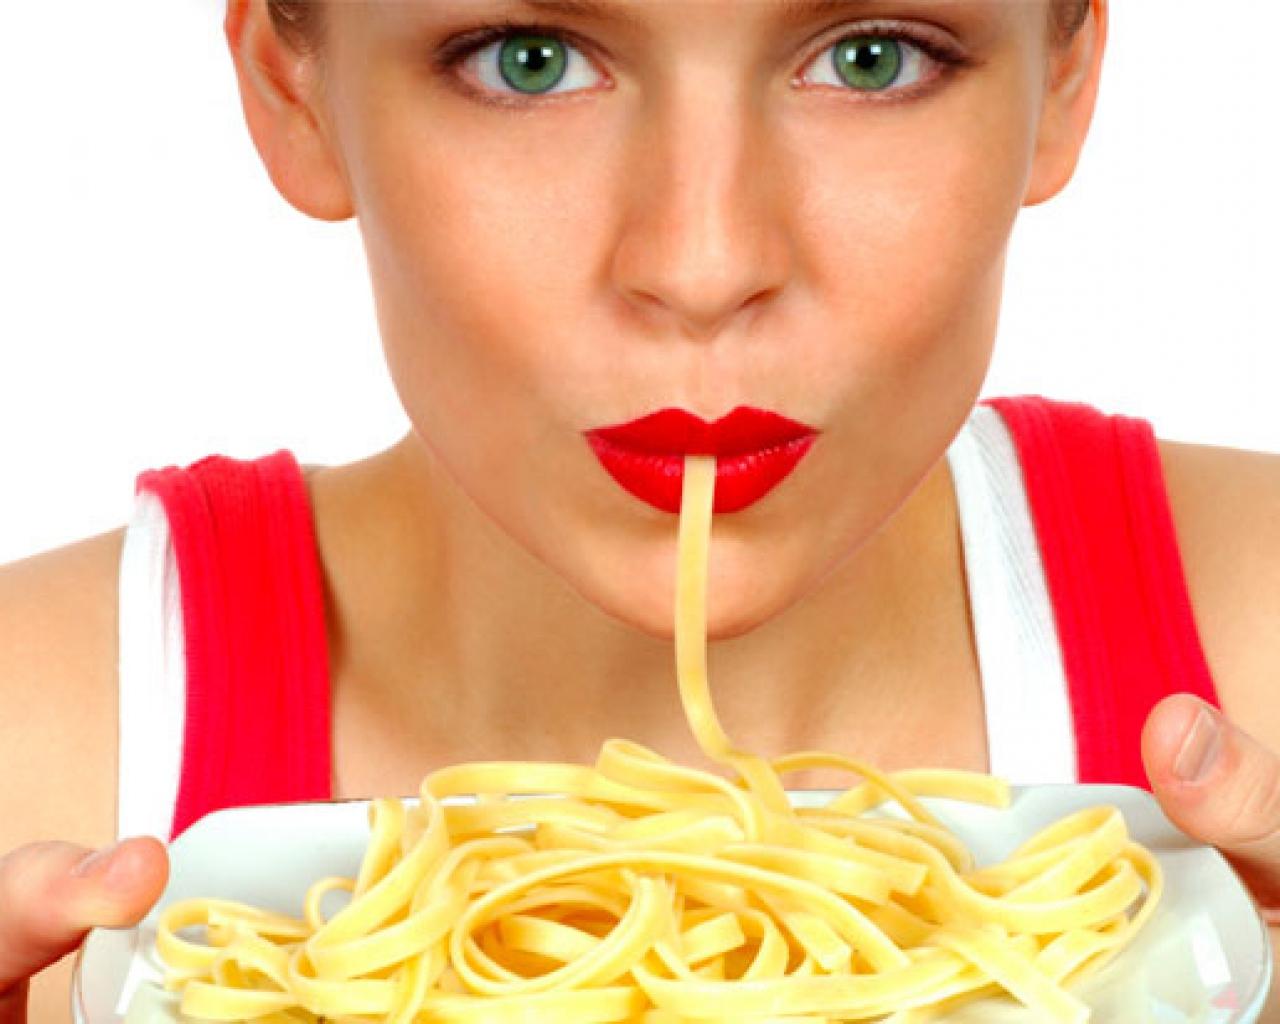 https://elsol-compress.s3-accelerate.amazonaws.com/imagenes/000/741/682/000741682-carbohidratos-dieta.jpg